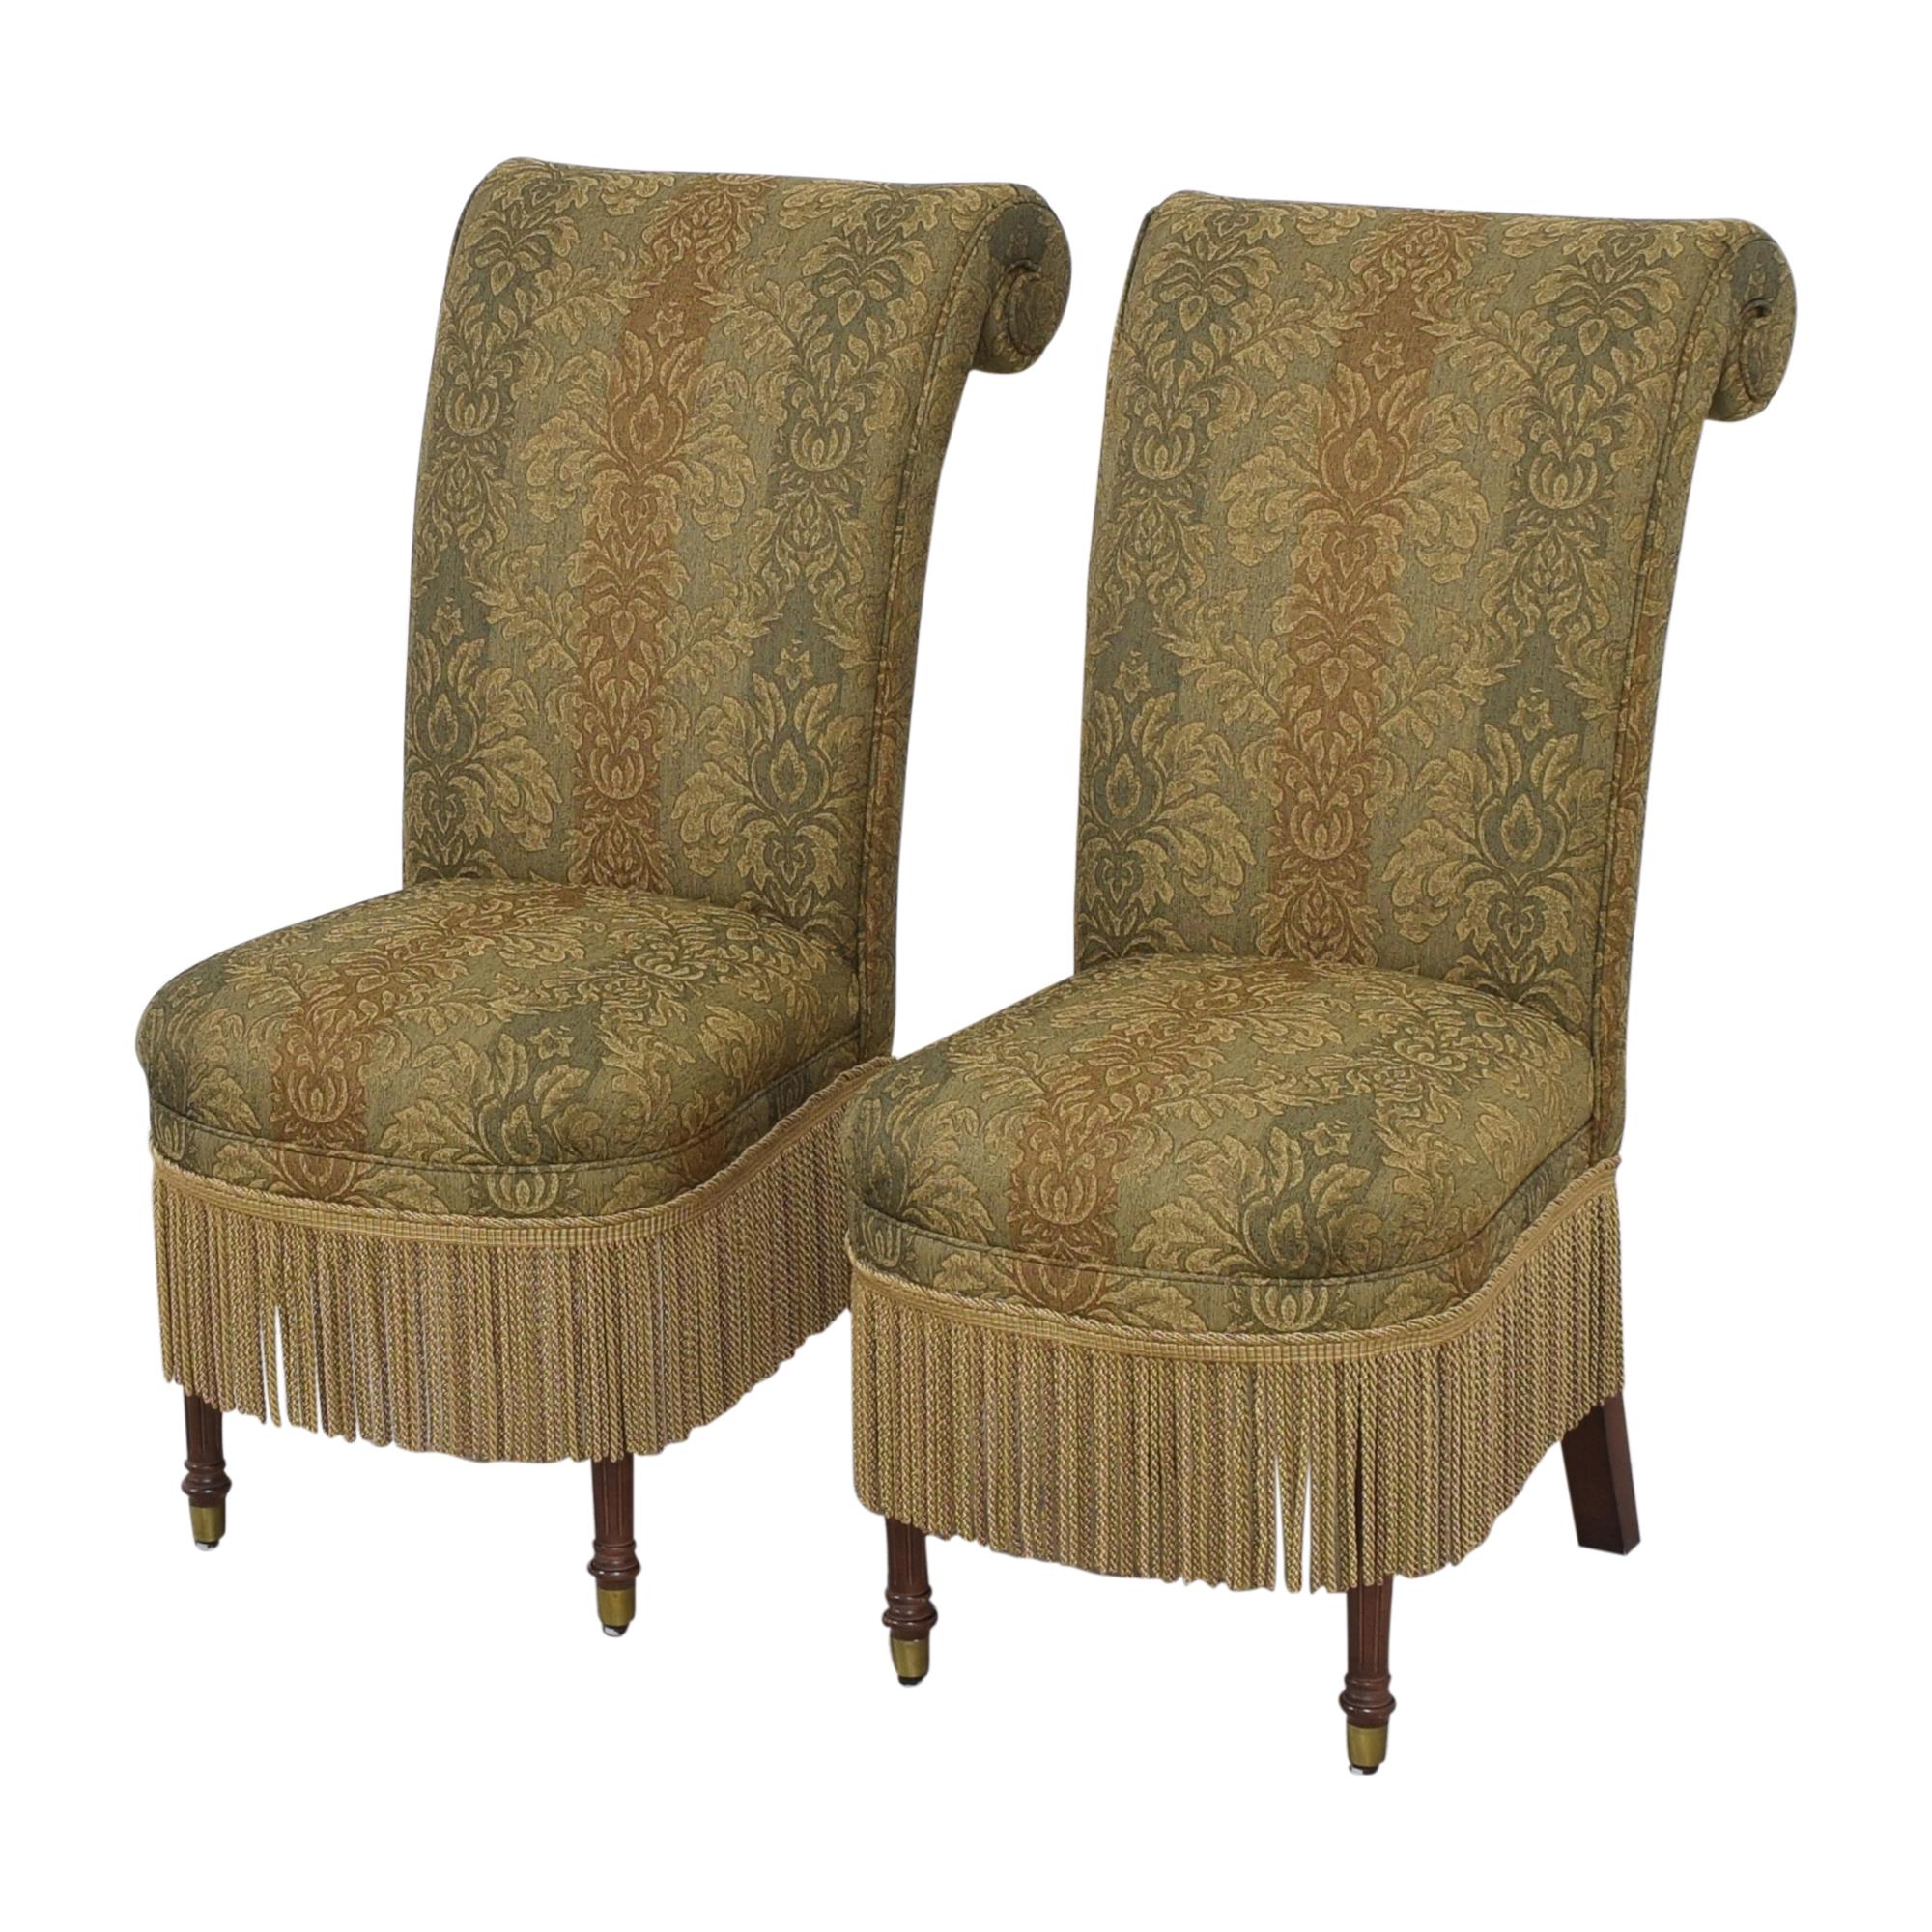 shop Designmaster Furniture Designmaster Furniture Tasseled Dining Chairs online